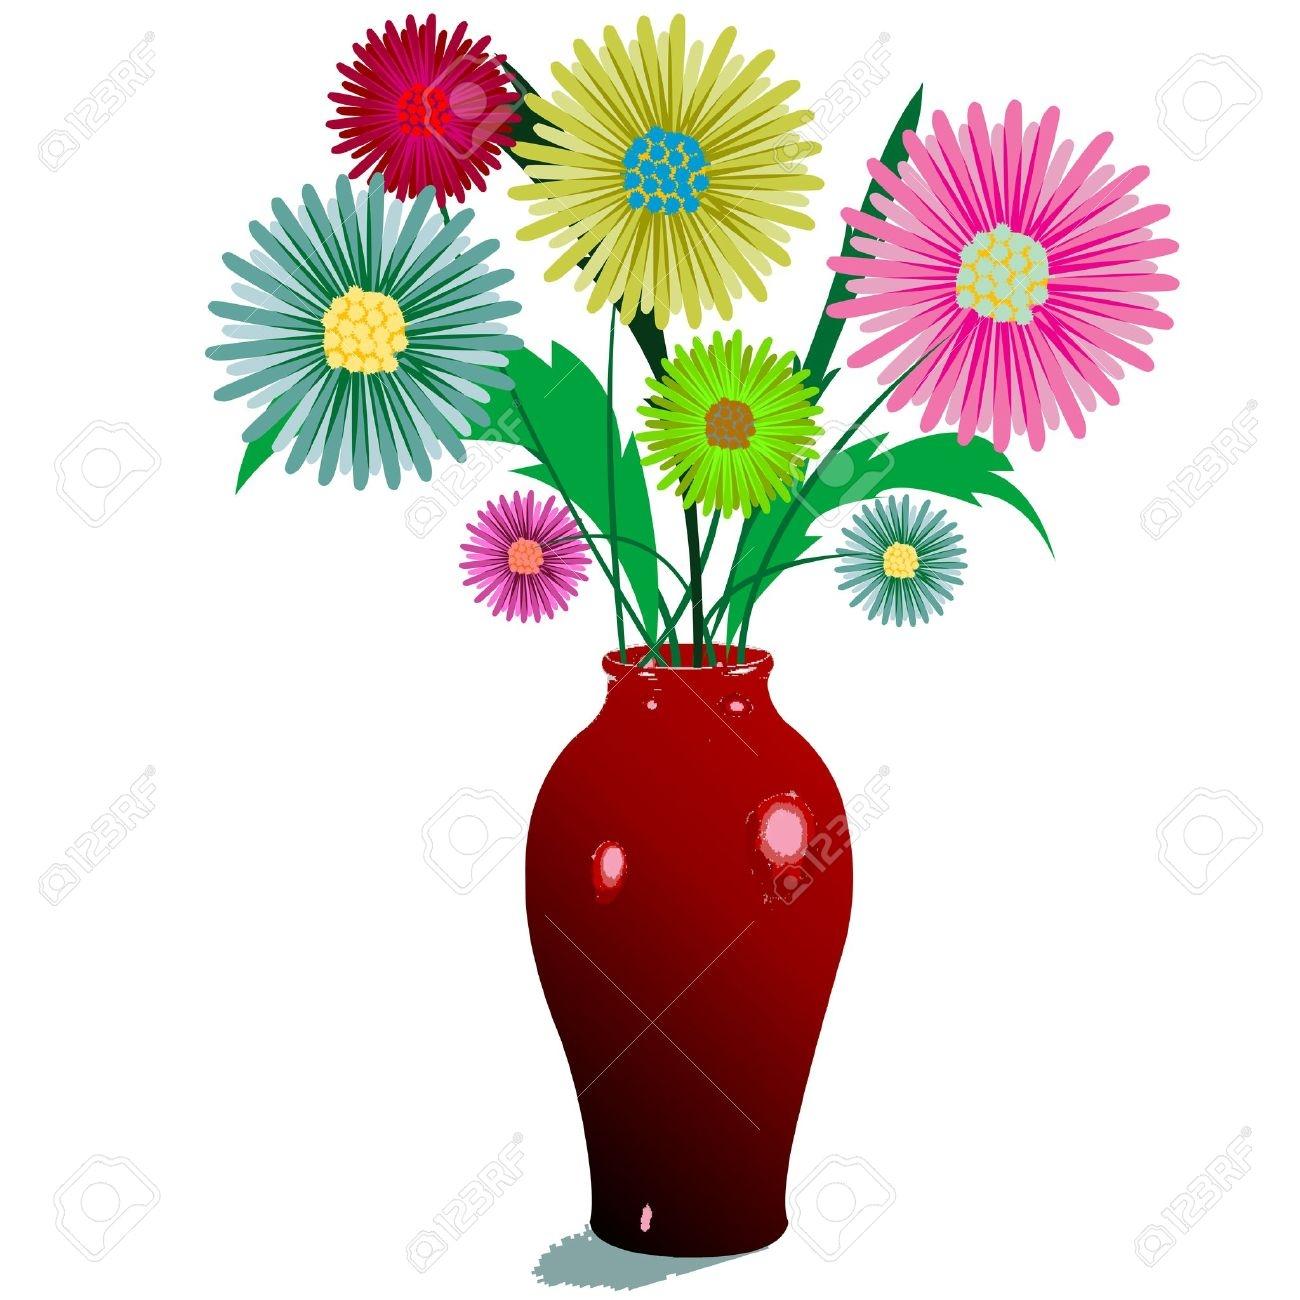 Vase clipart cute Vase clipart Vase clipart #4